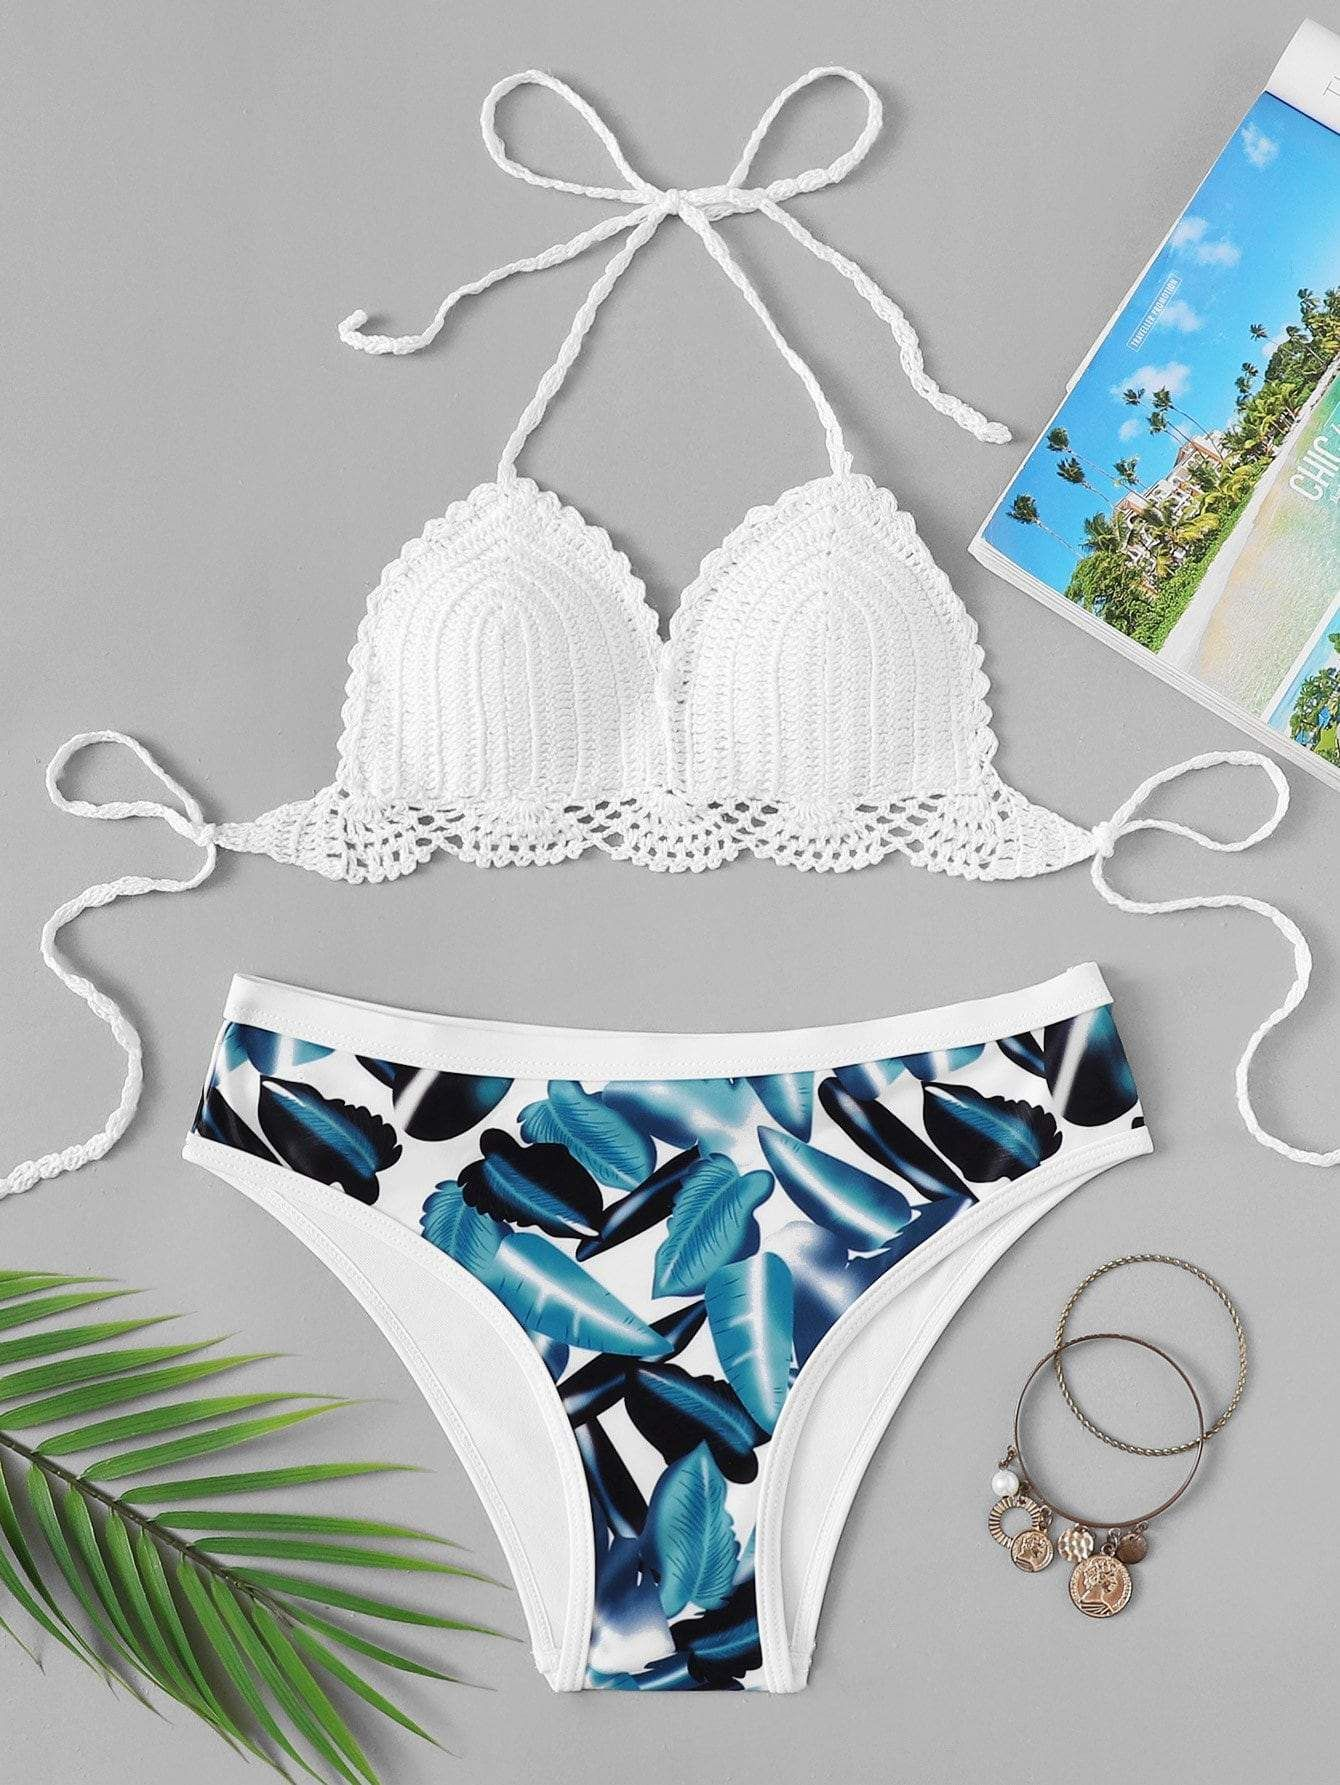 350d5bab00 crochet top with tropical print bikini set. #swimwear #beachwear #swimsuits  #bathingsuits #fashion